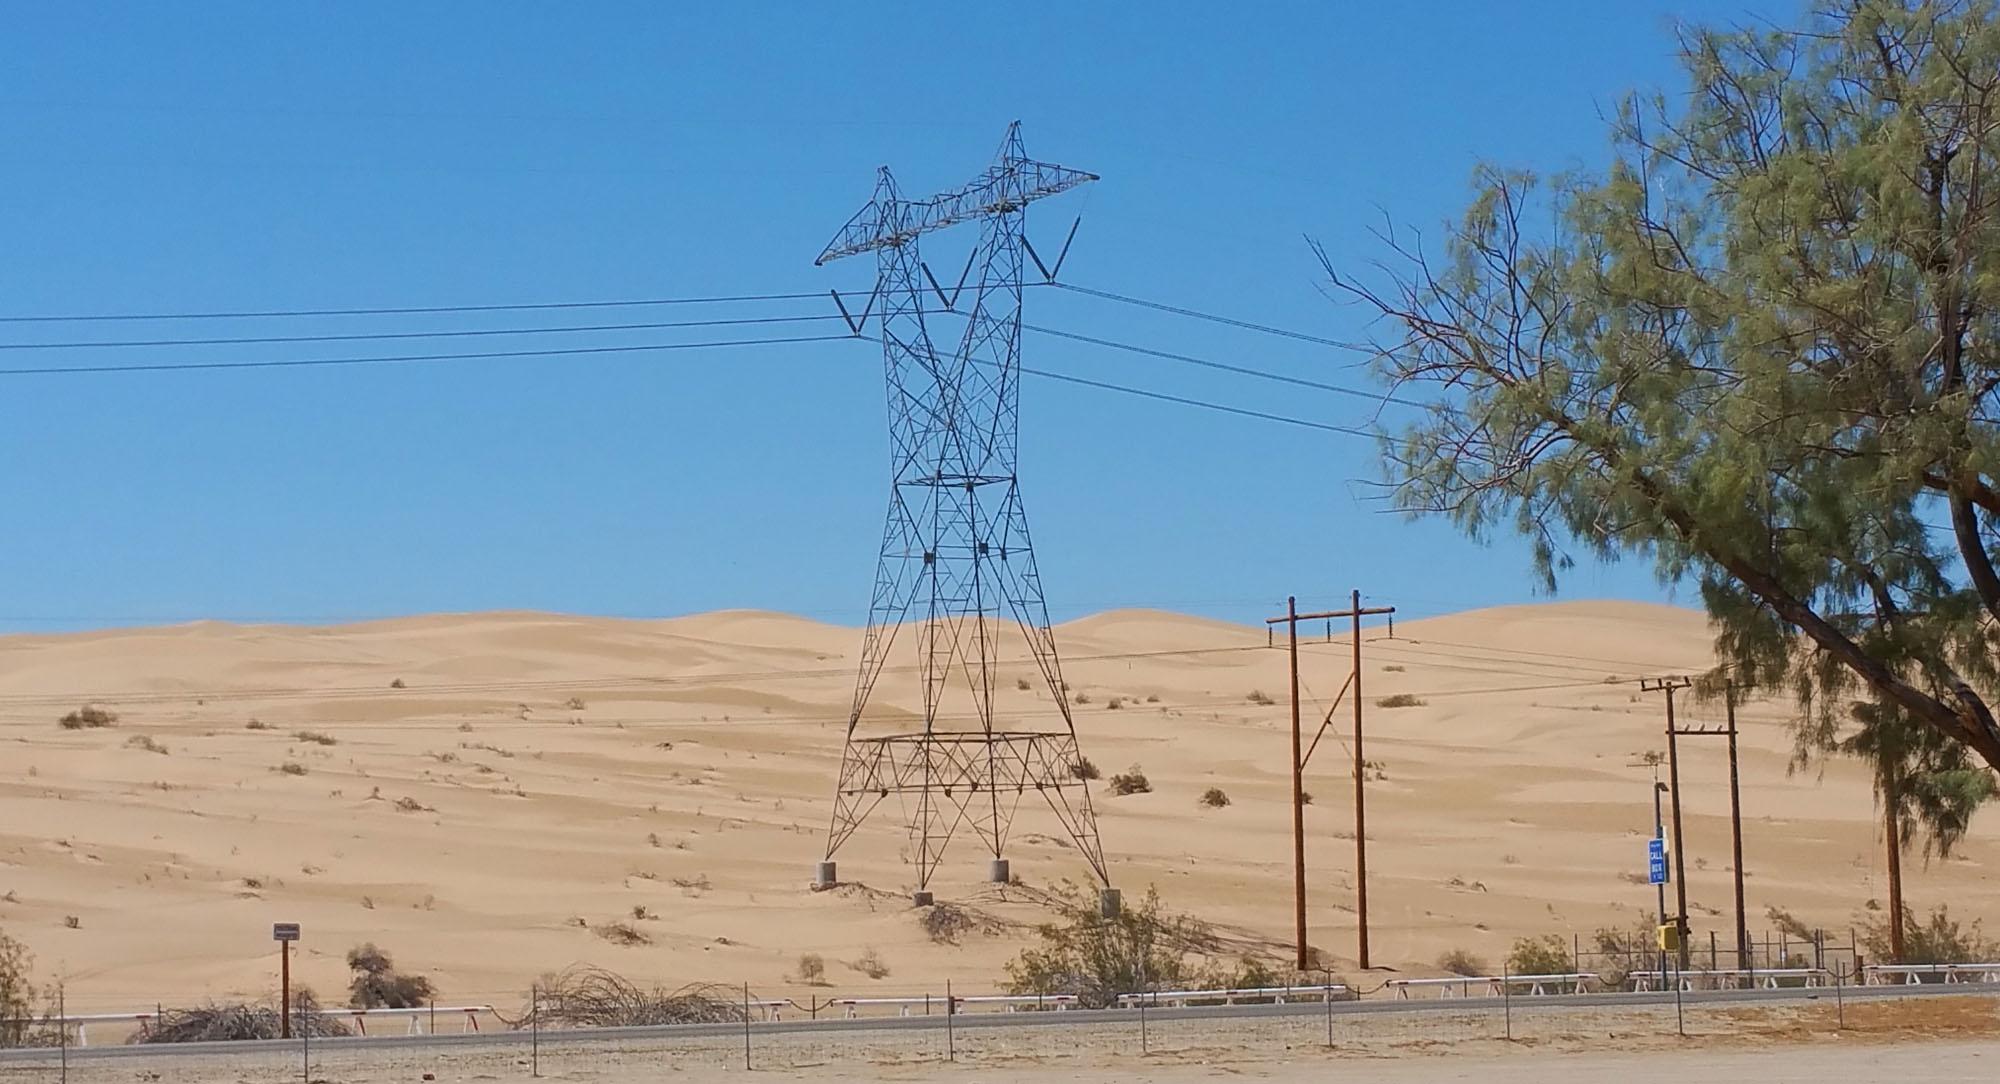 dunes-desert-california